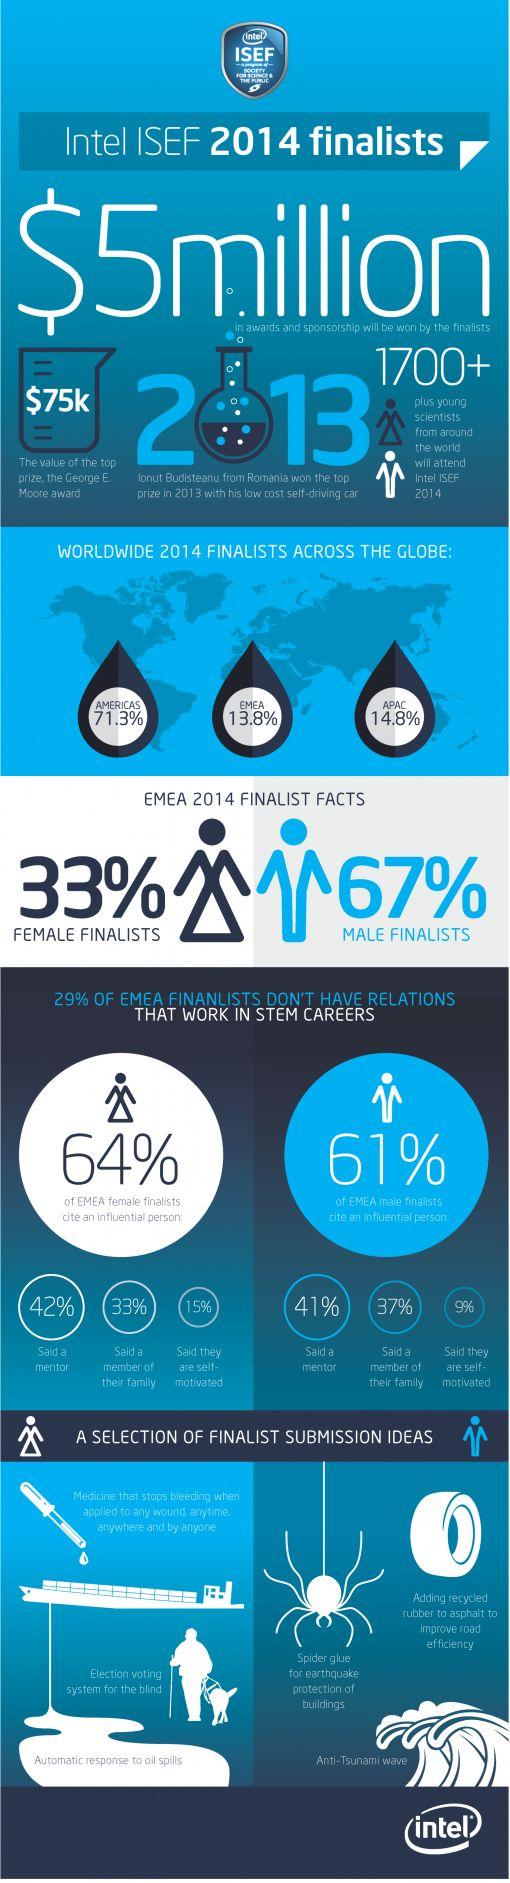 Intel_ISEF_infographic_v.2